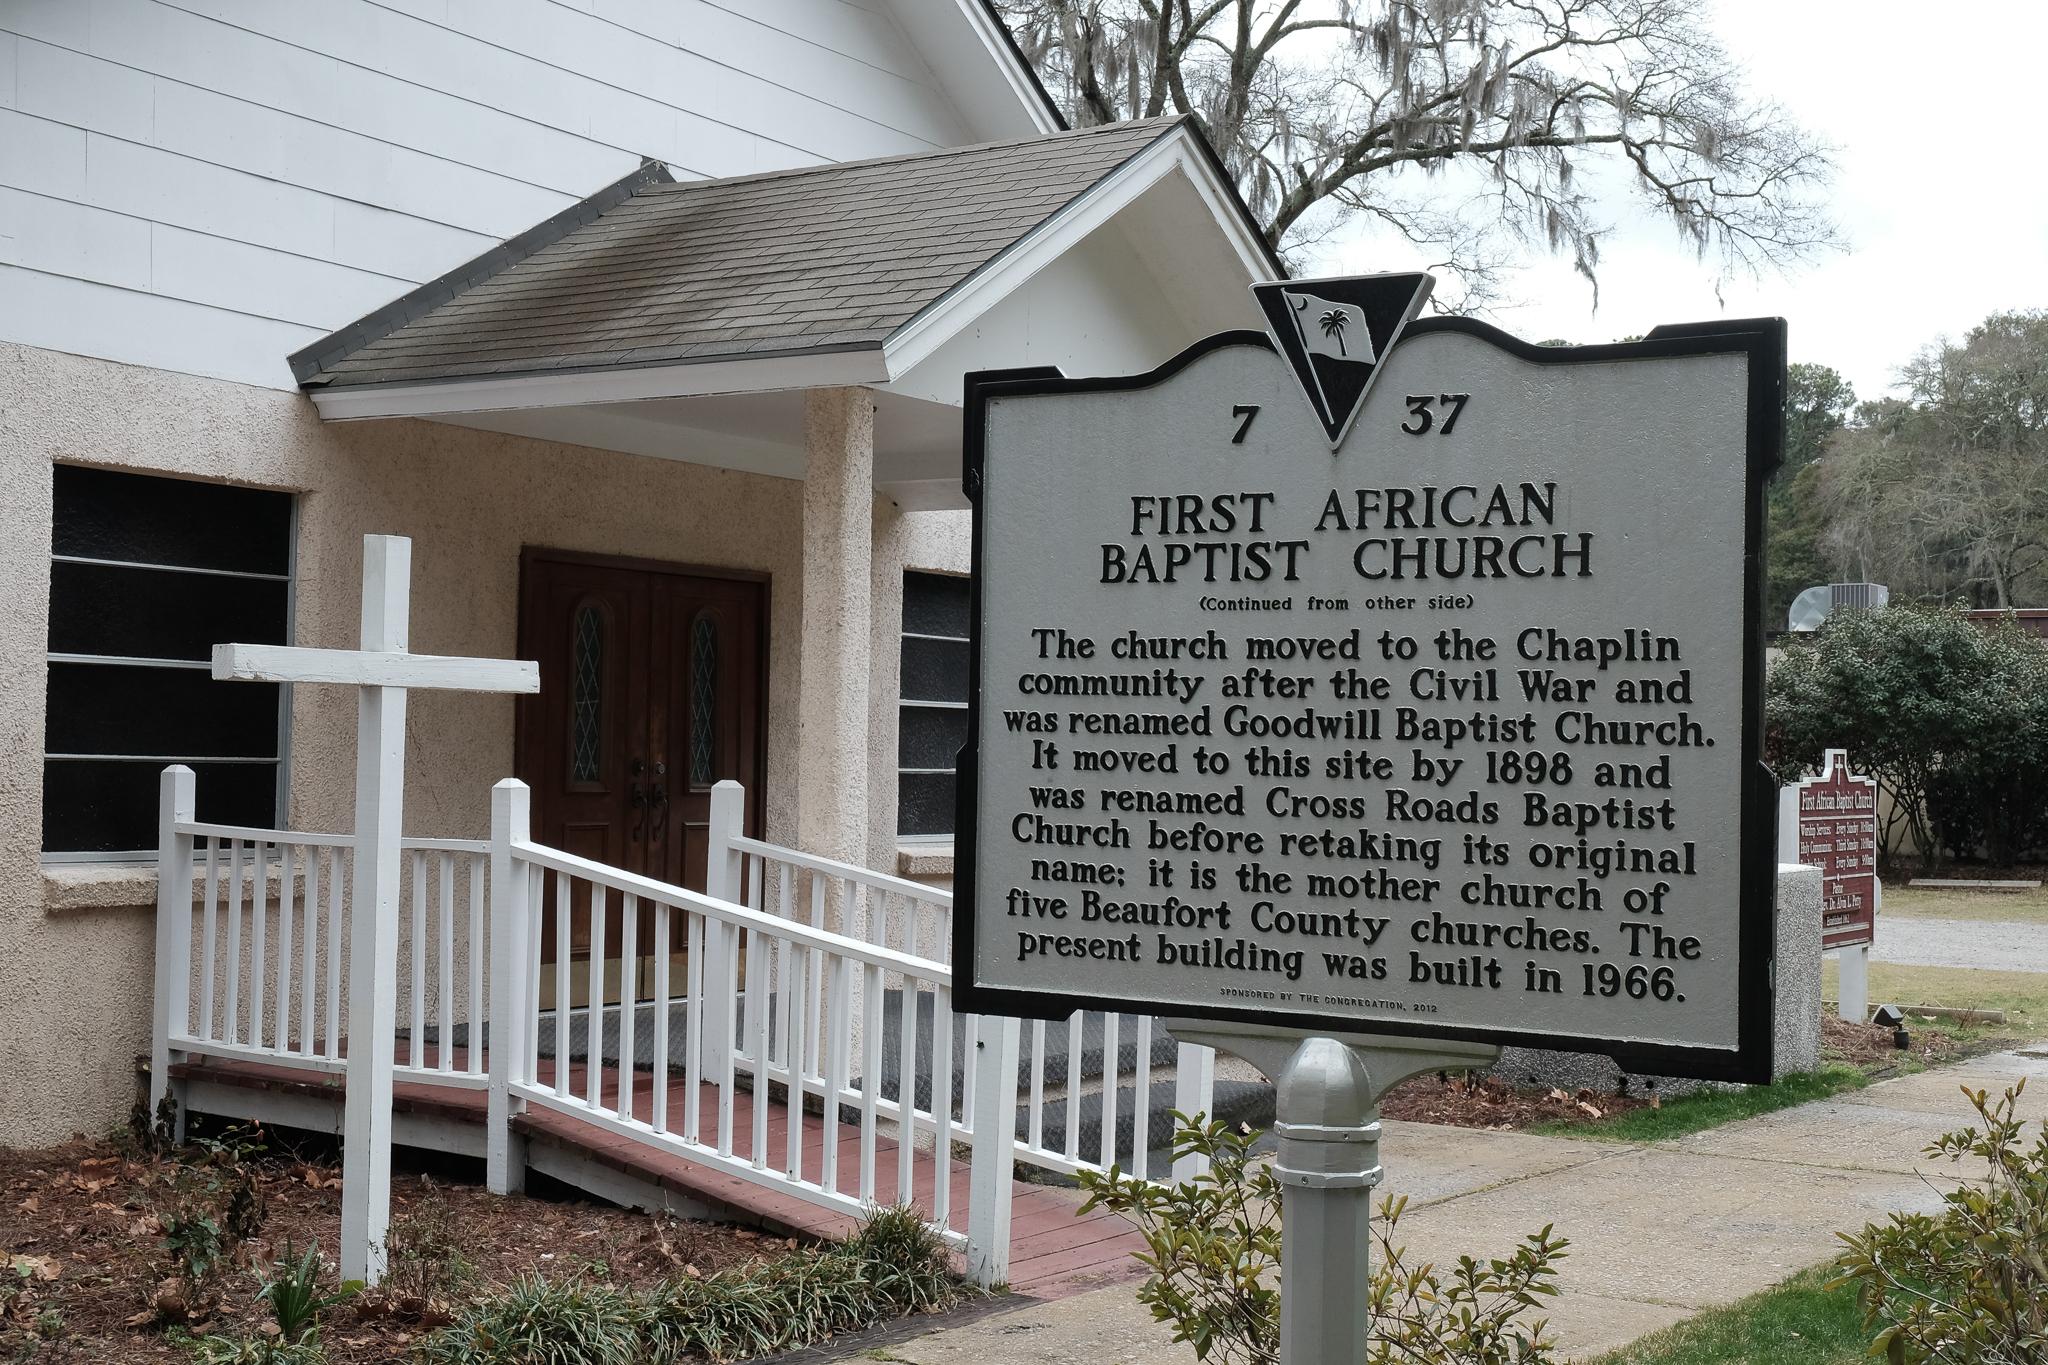 Historical marker, First African Baptist Church